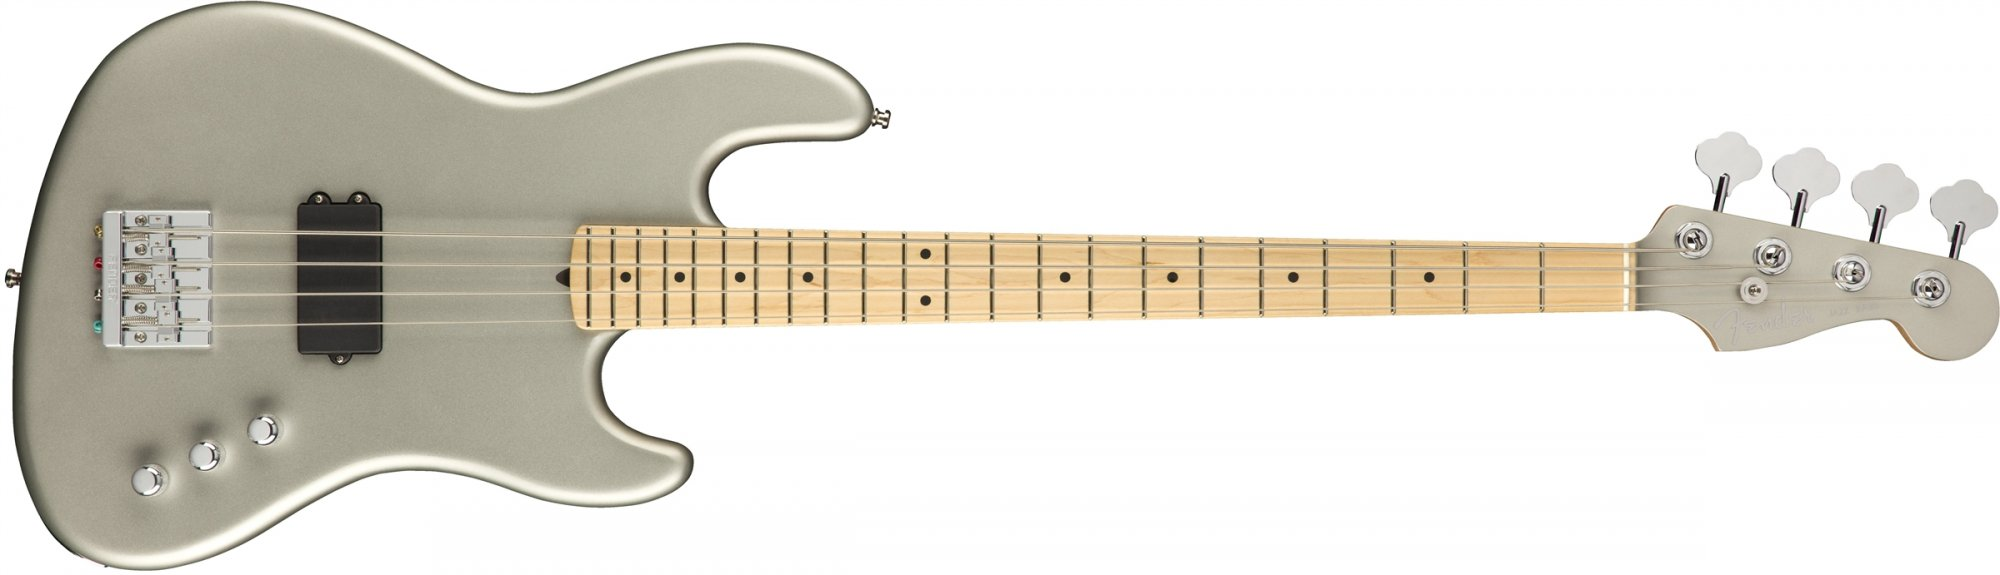 Flea Signature Bass Guitar